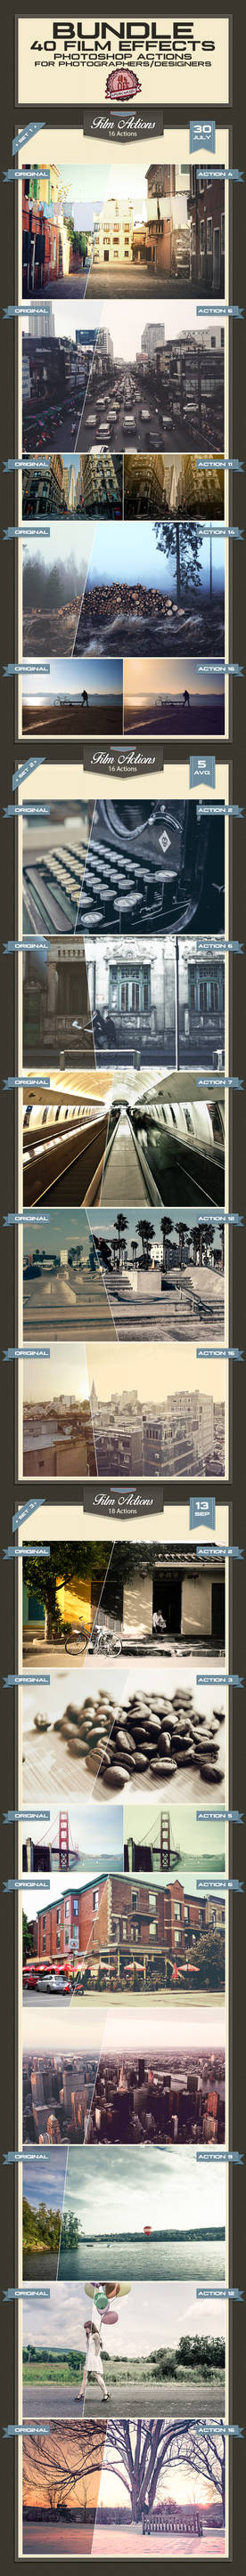 Film Effects Photoshop Actions - Premium!